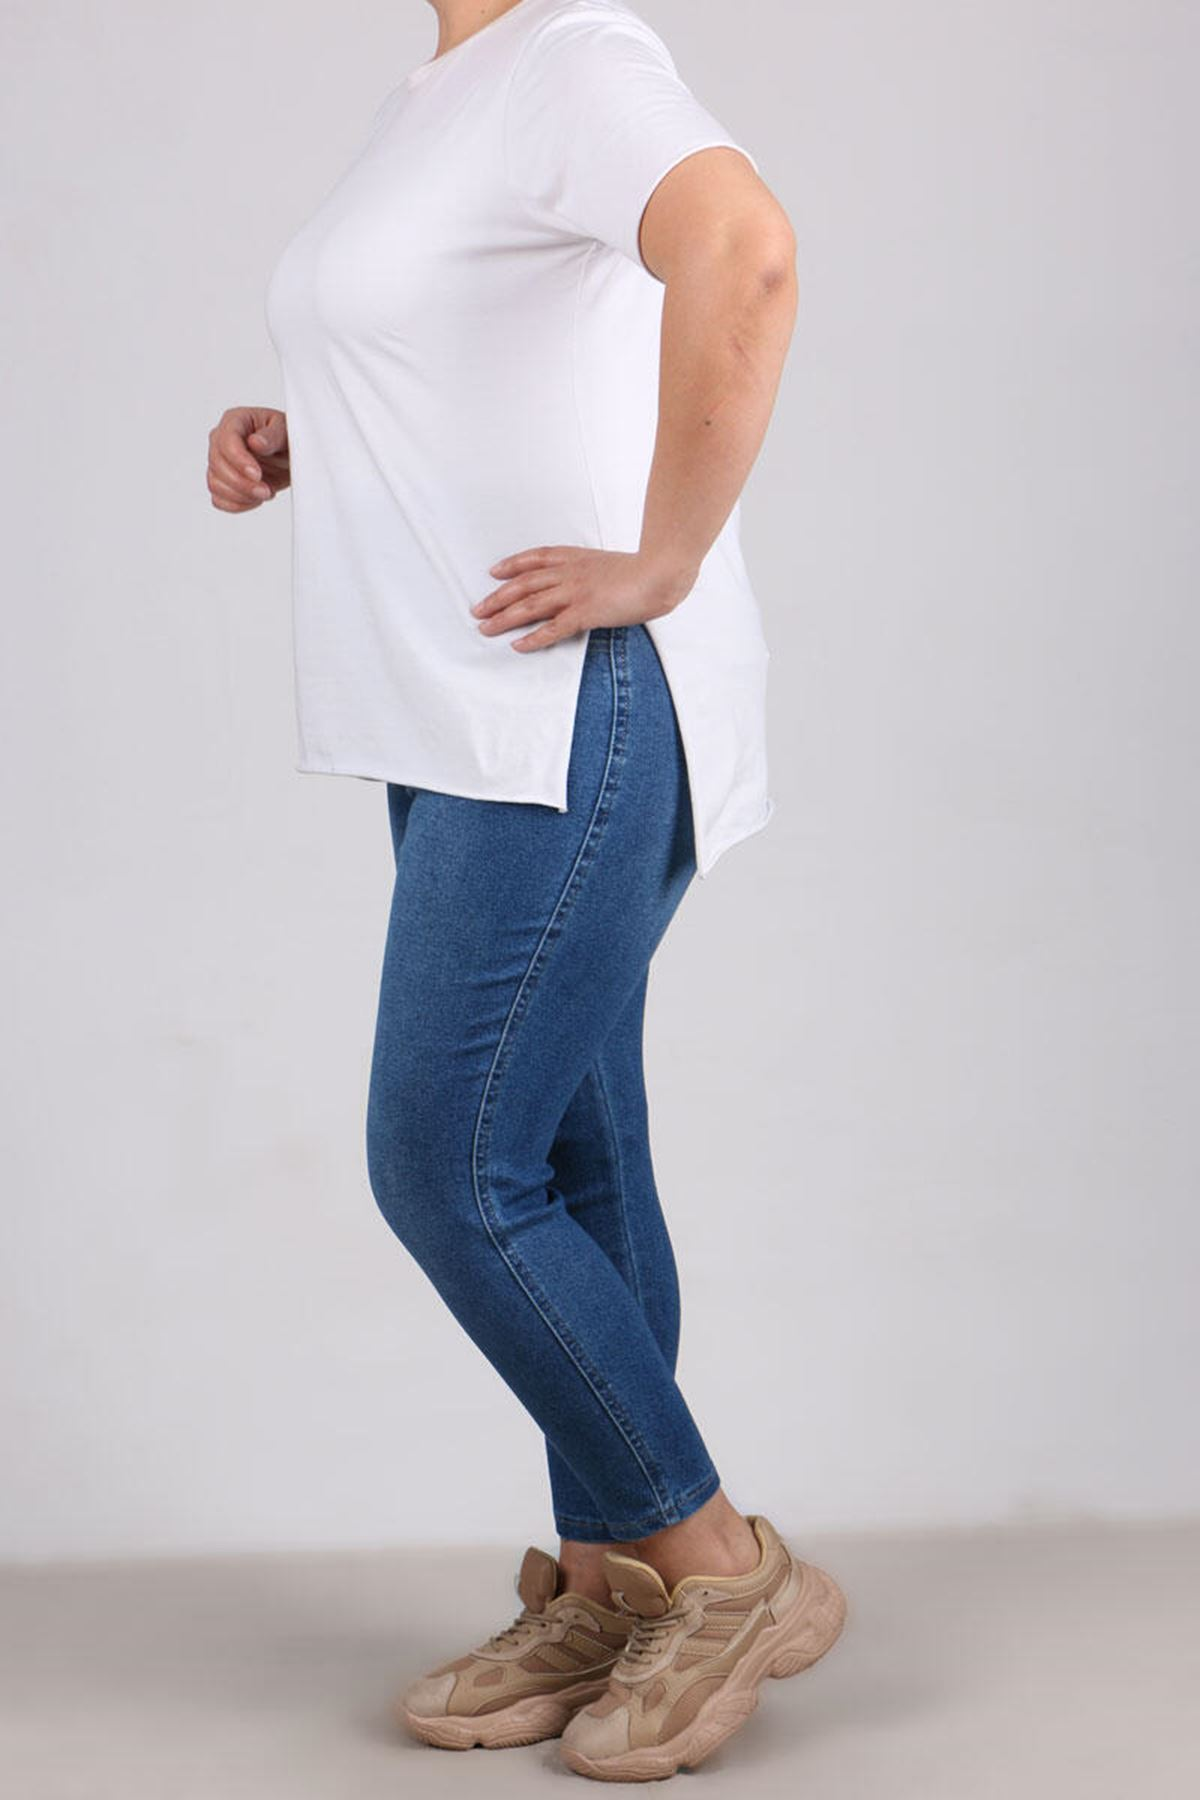 9109-5 Plus Size Elastic Waist Skinny Leg Jeans - Ice Blue